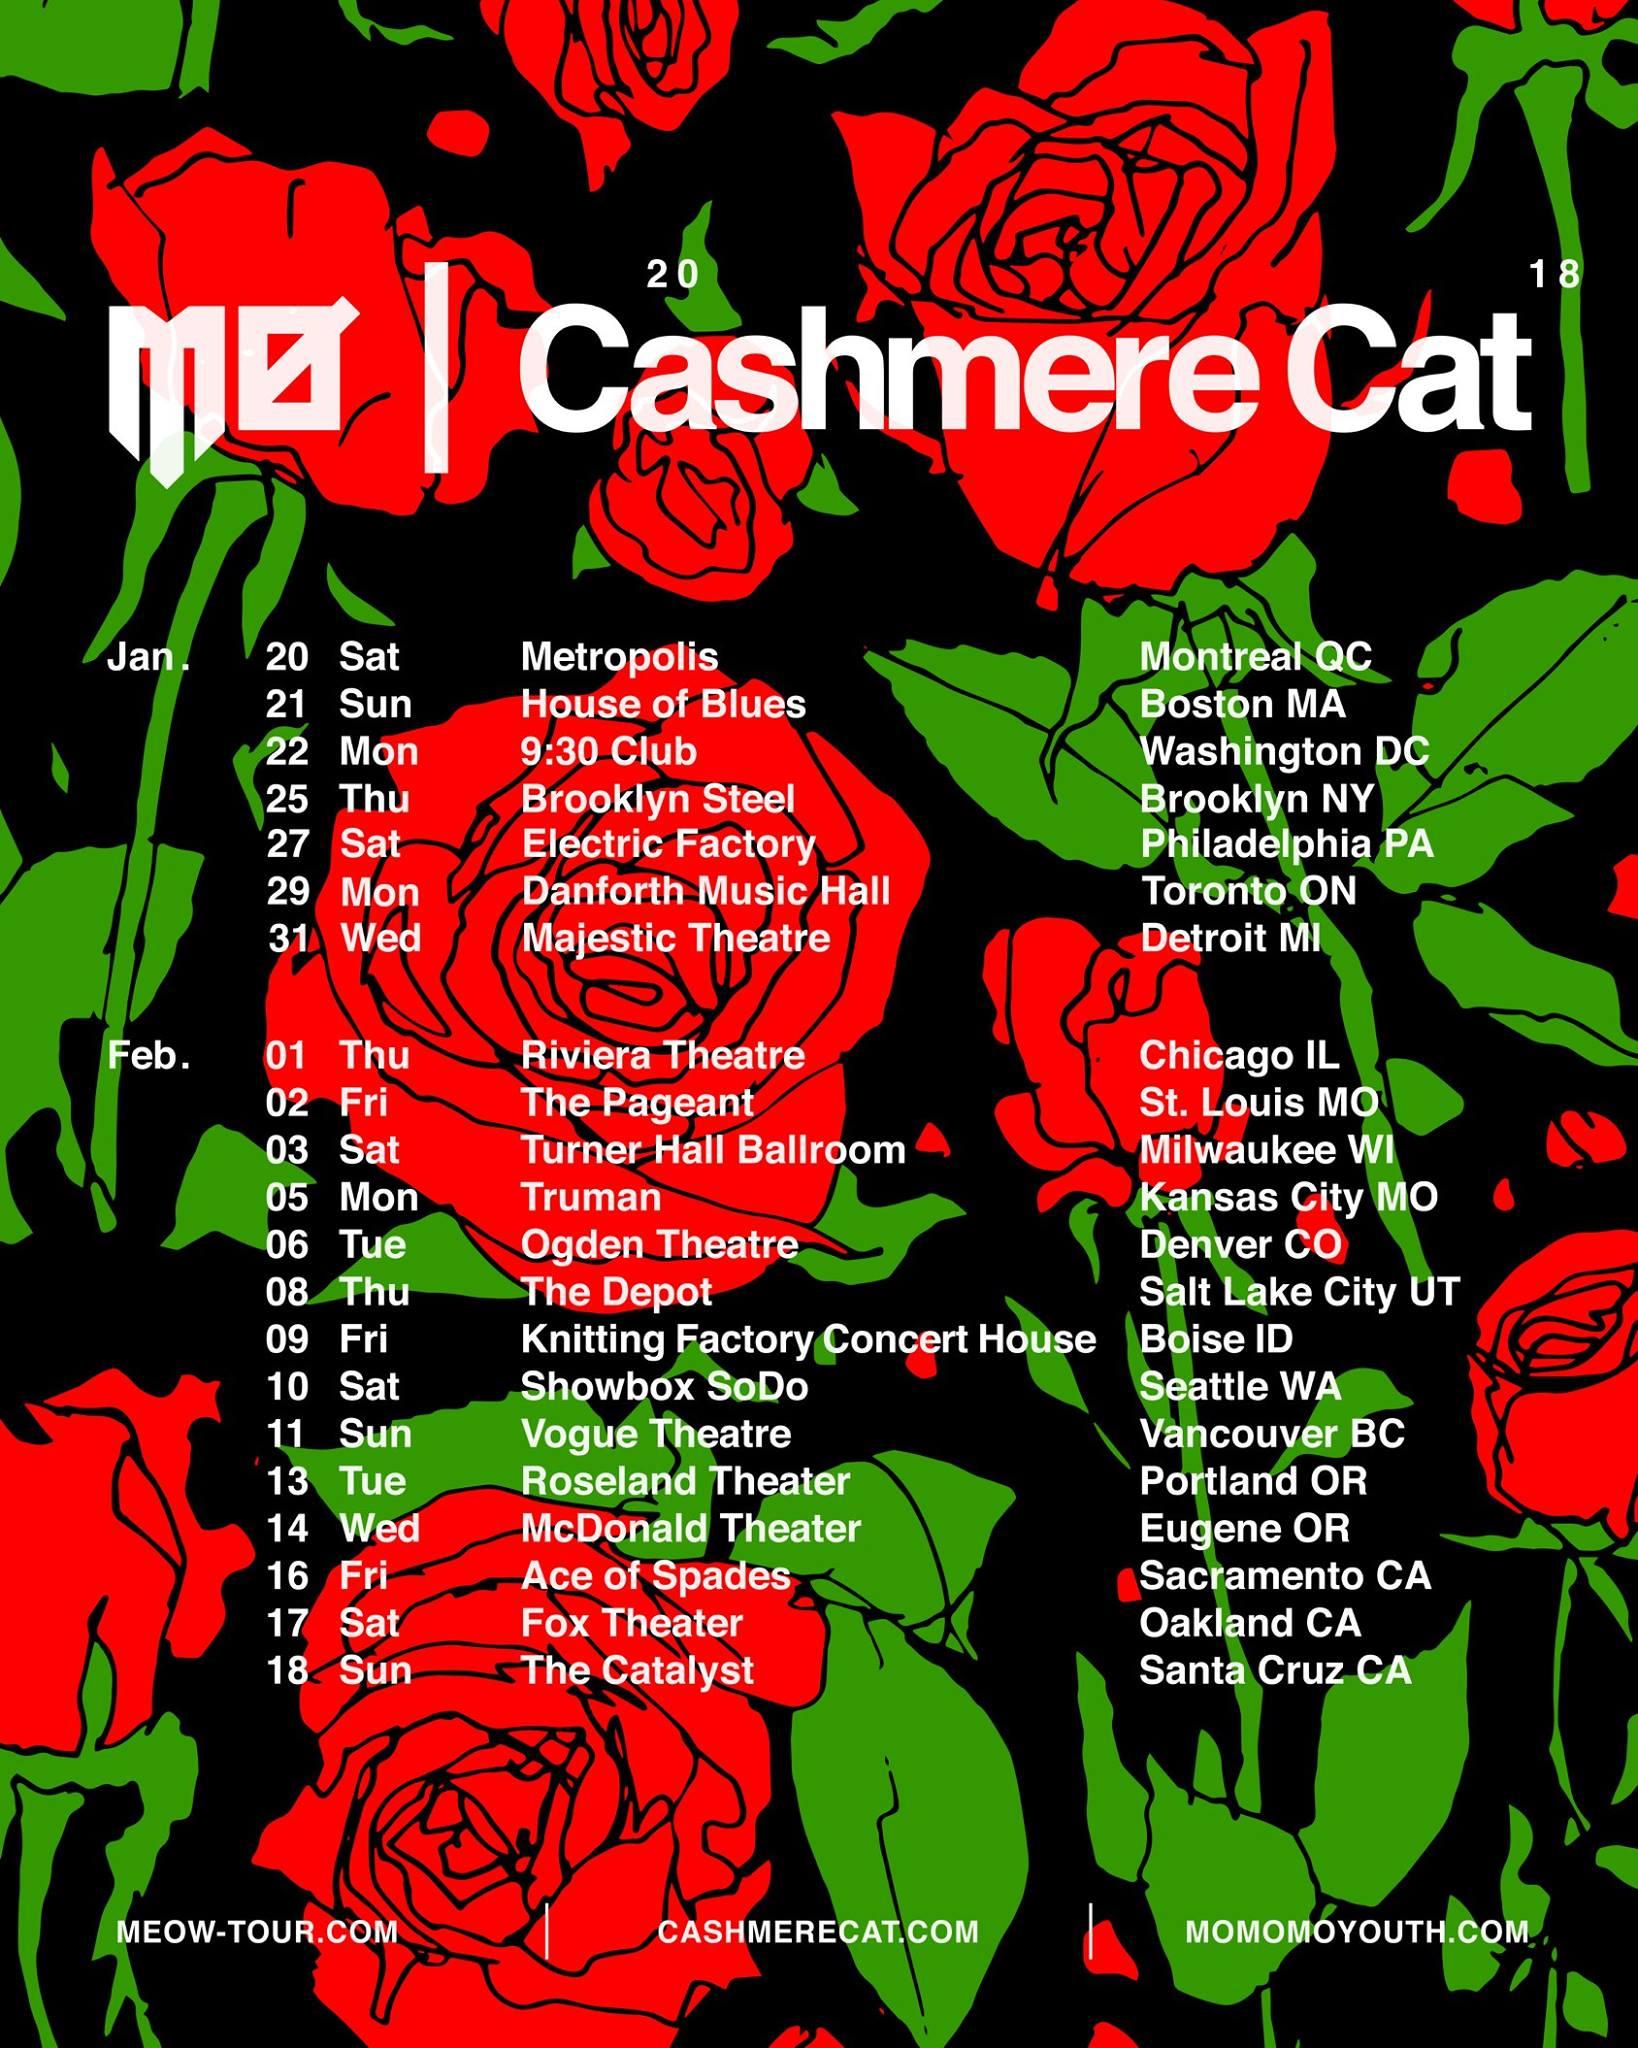 California EDM Concerts Events Festivals Calendar Page 1